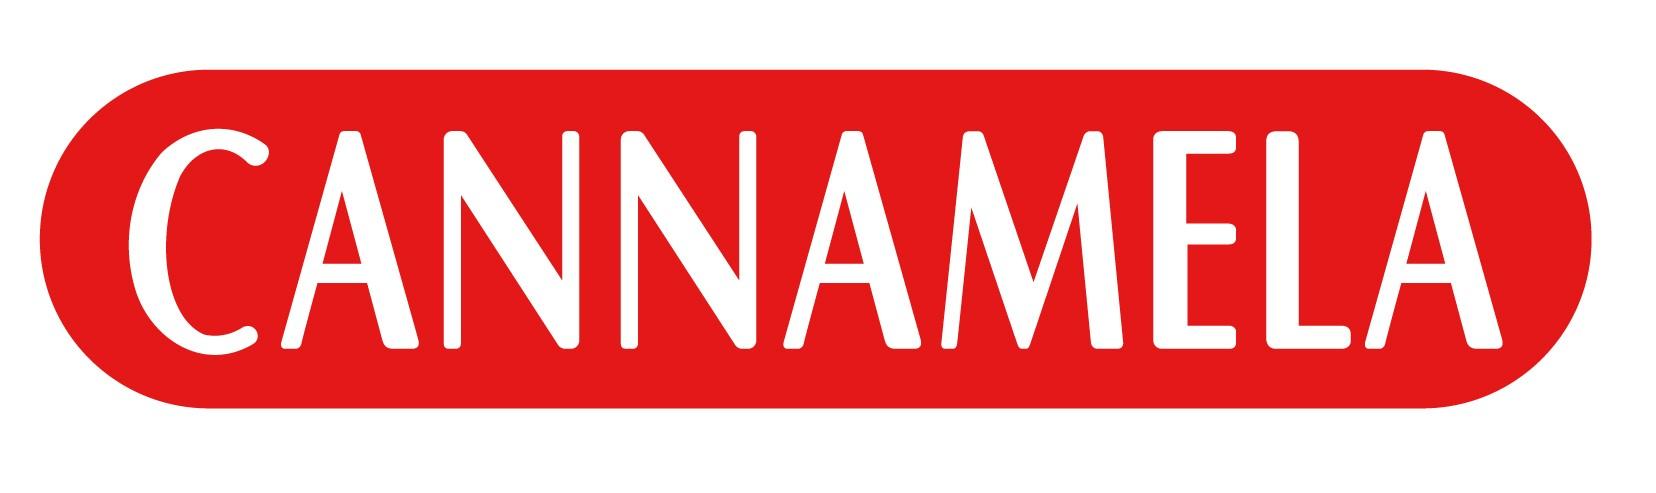 logo cannamela